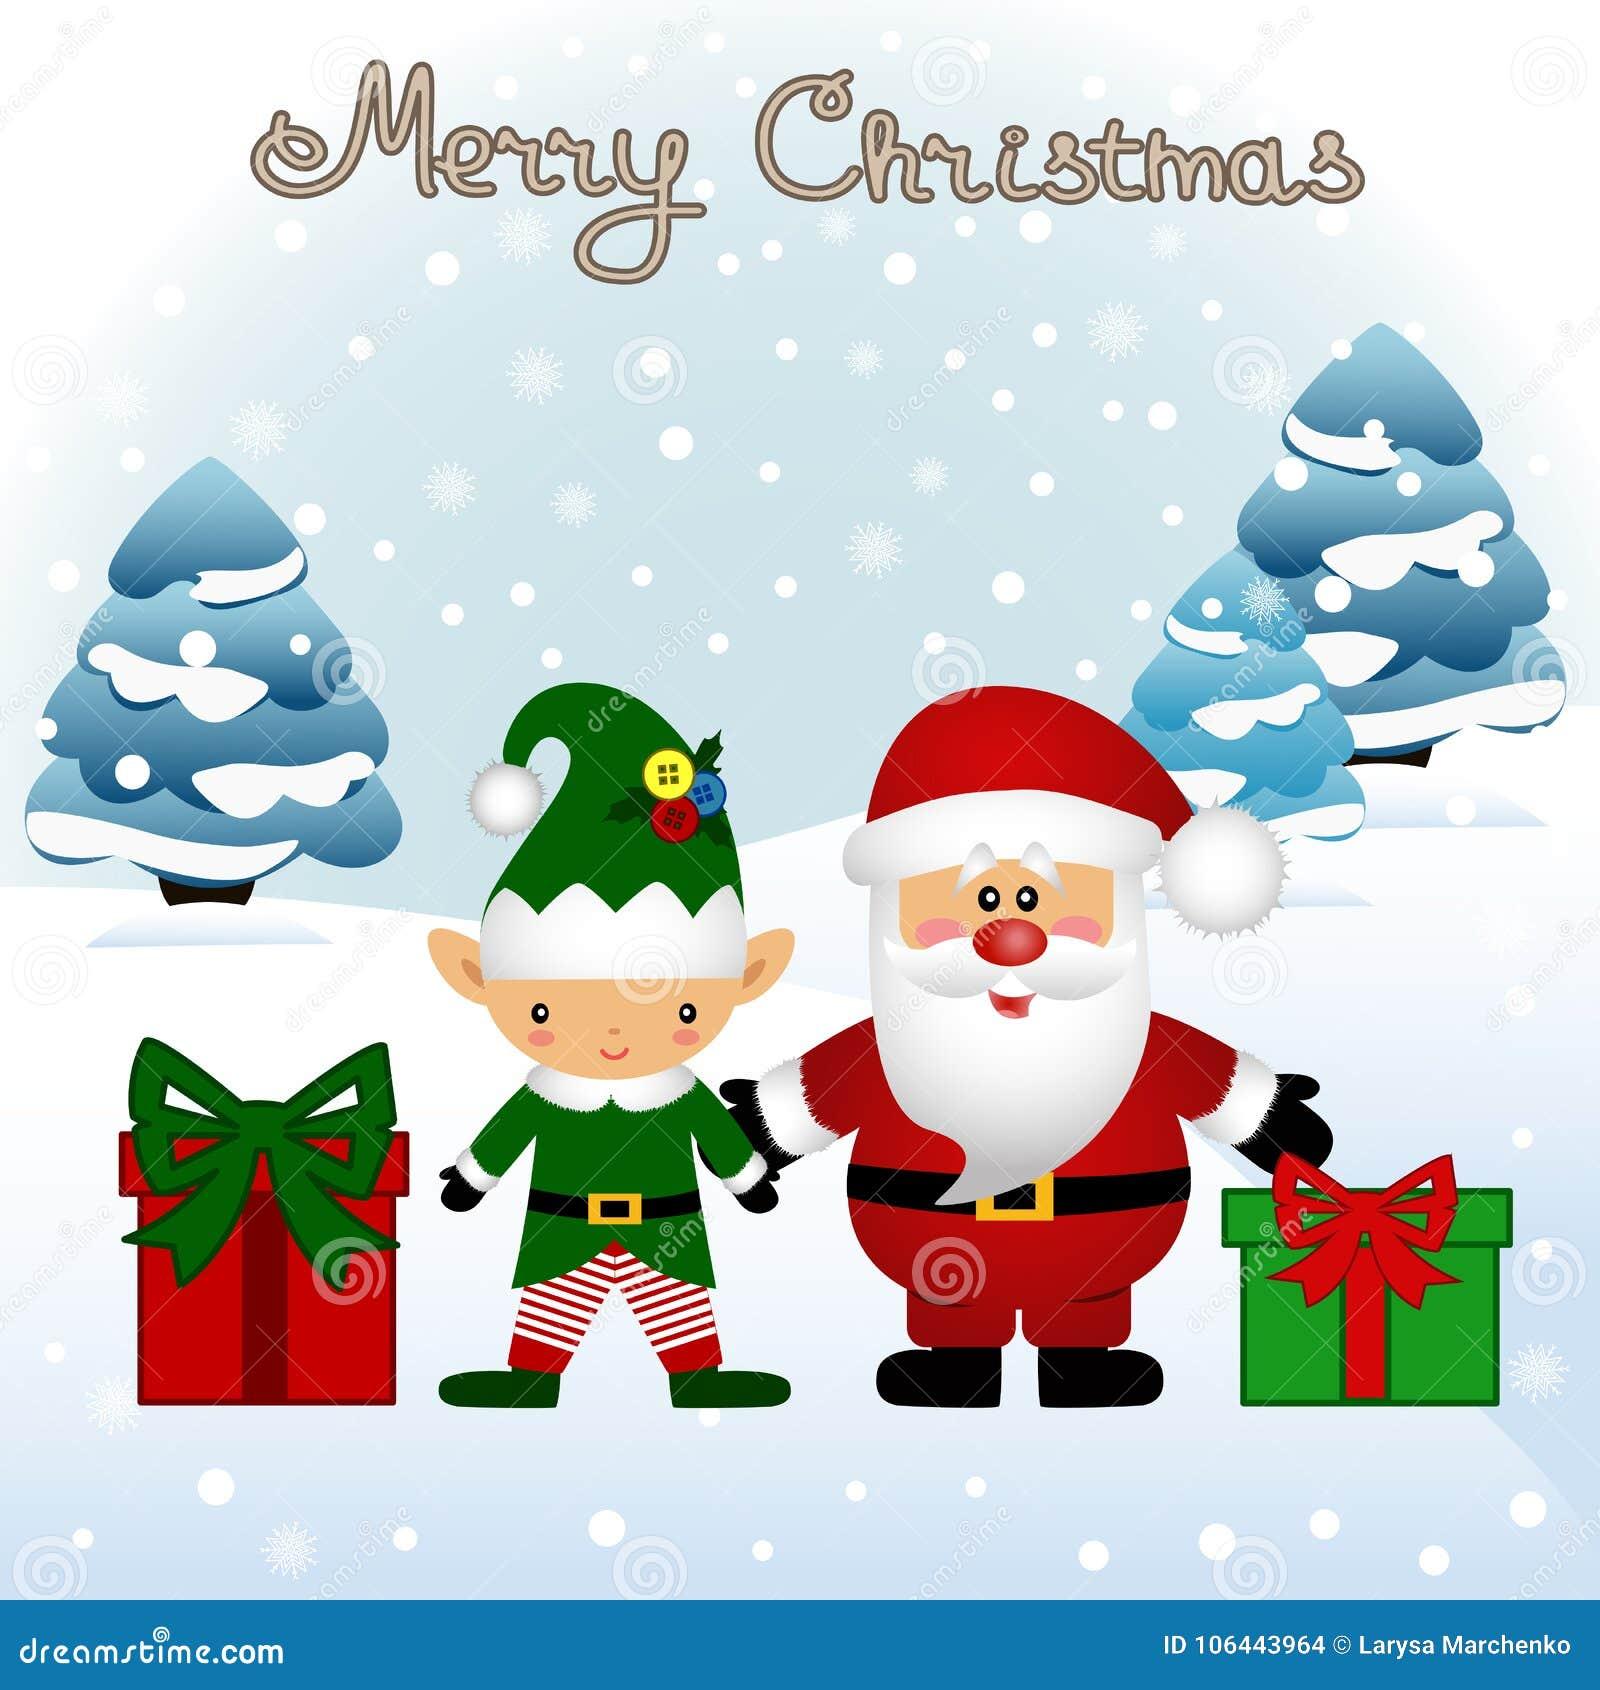 download christmas card funny postcard with christmas elf and santa stock vector illustration - Elf Christmas Card